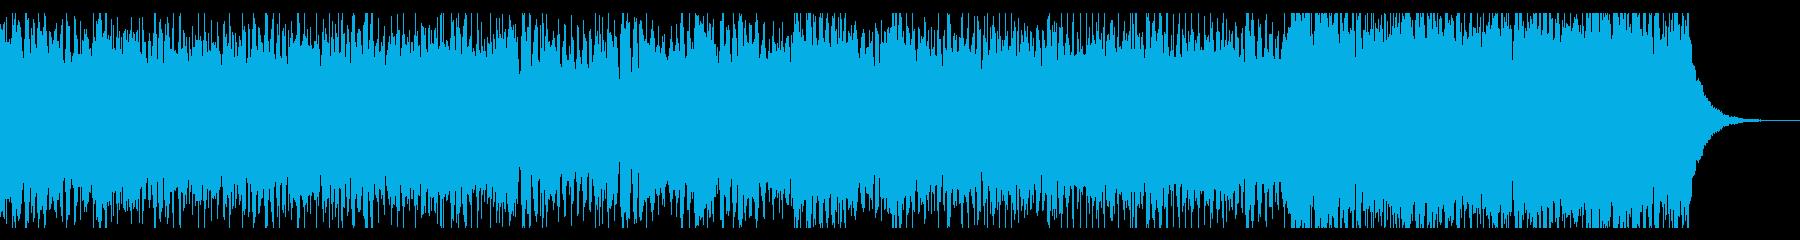 EDM お洒落 エモい 盛り上がるの再生済みの波形